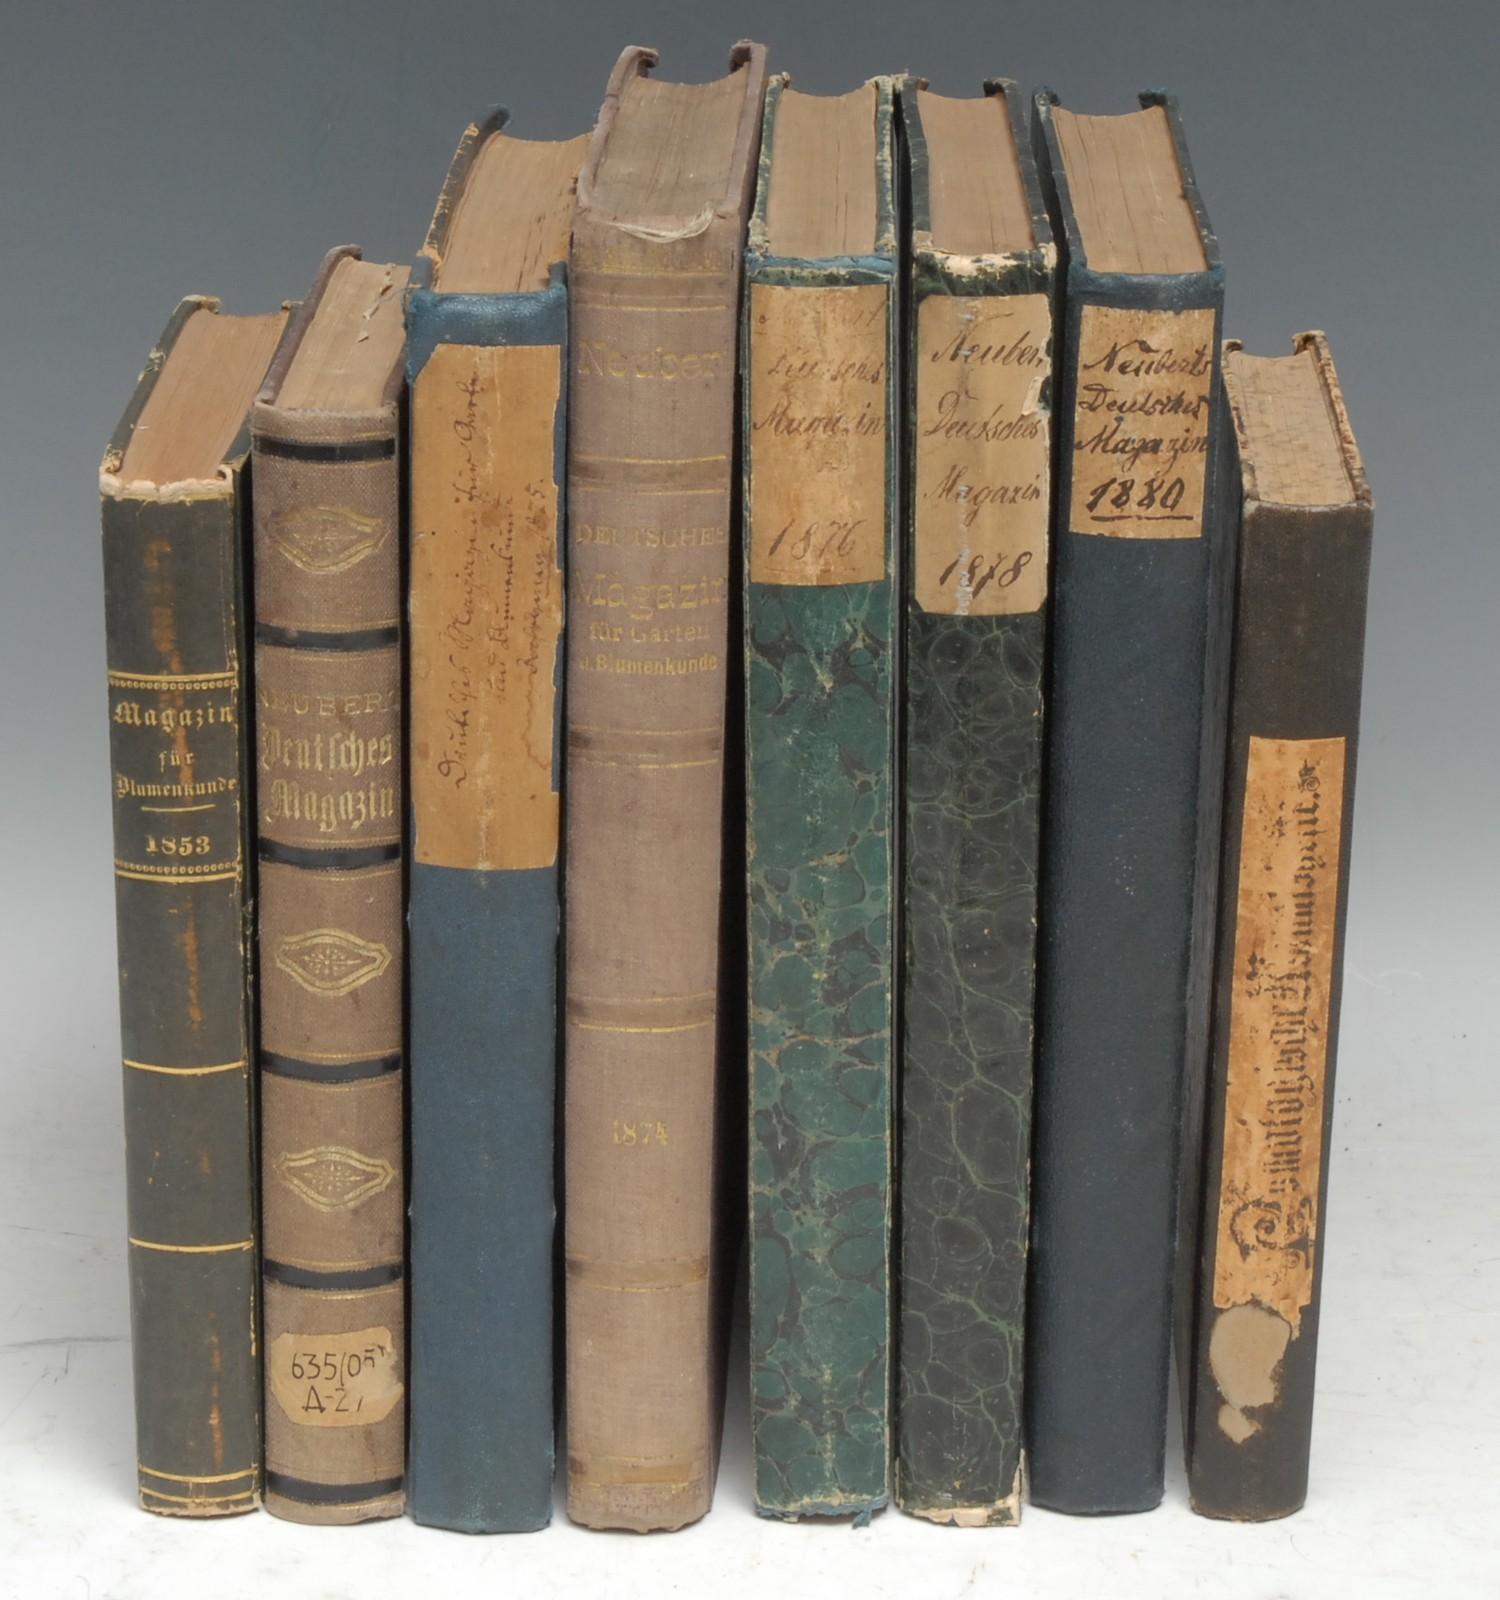 Botany - Neubert (Wilhelm), seven volumes of the Deutsches Magazin: 1853, 1871, 1874, 1875, 1876, - Image 2 of 2